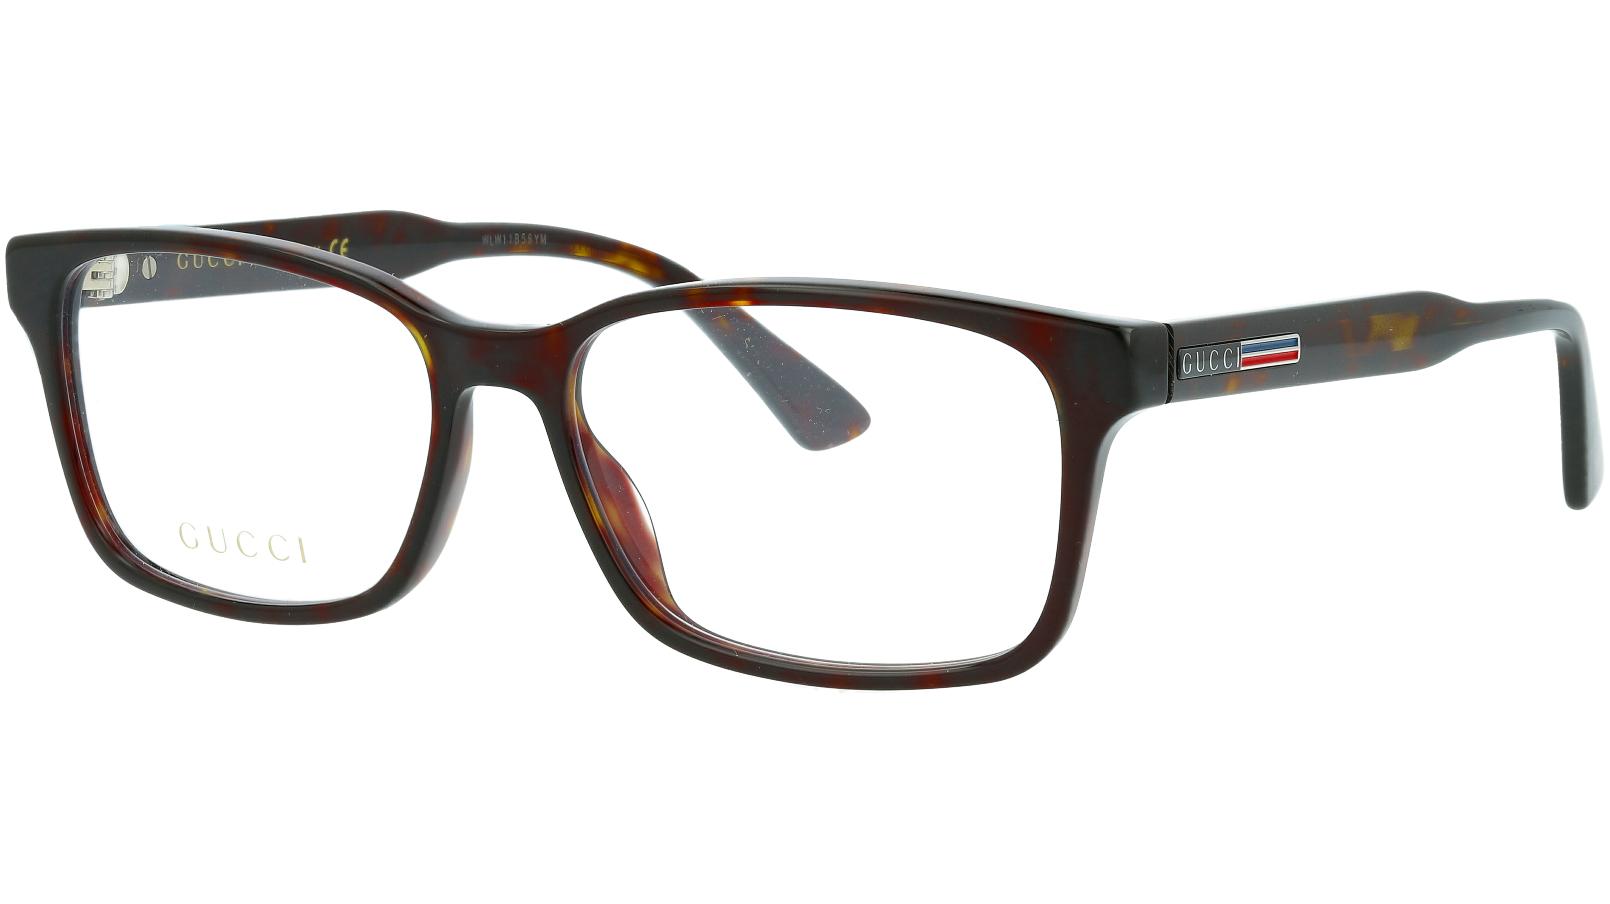 Gucci GG0826O 005 55 Havana Glasses